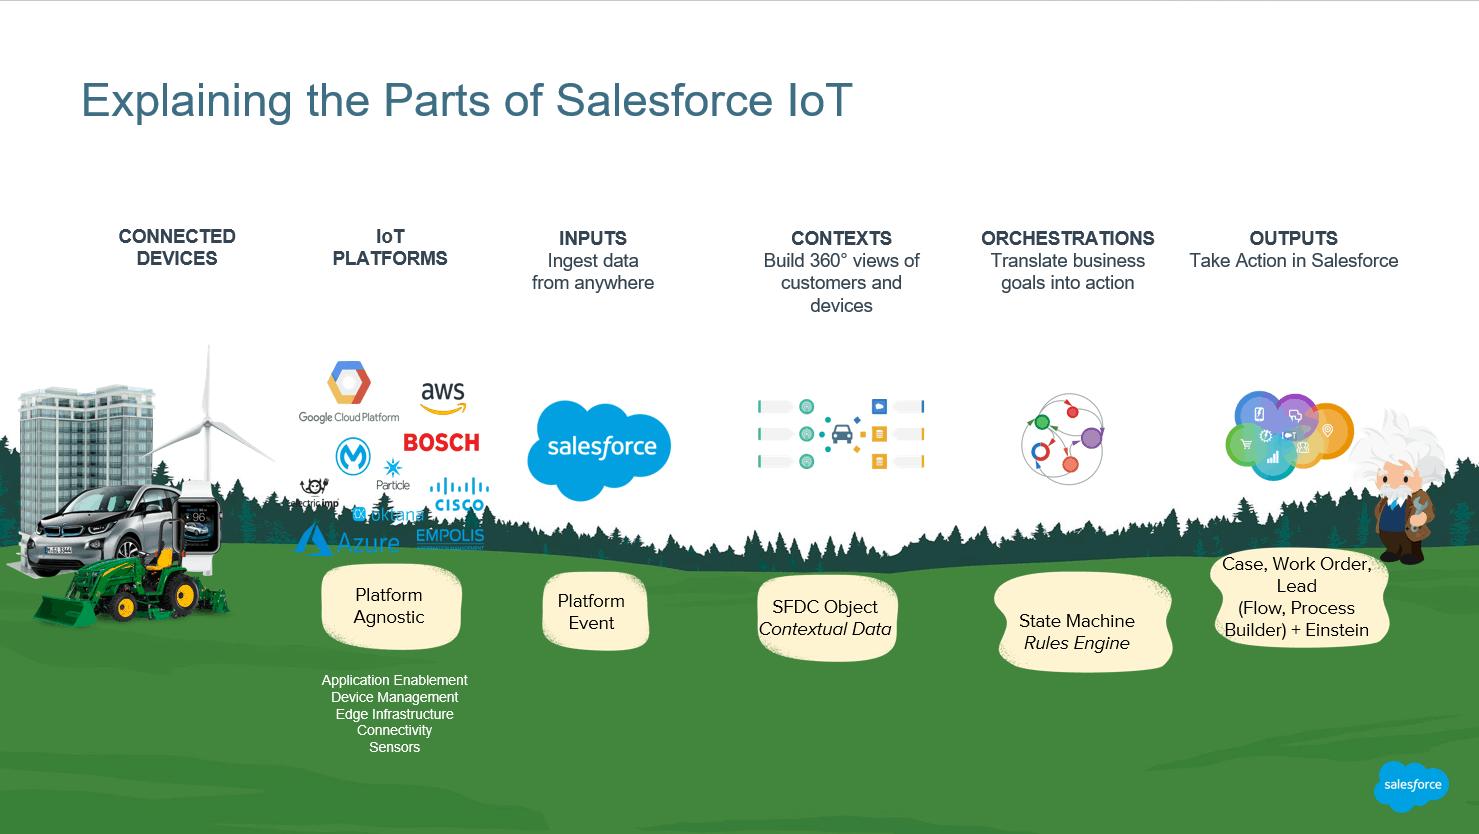 Salesforce IoT